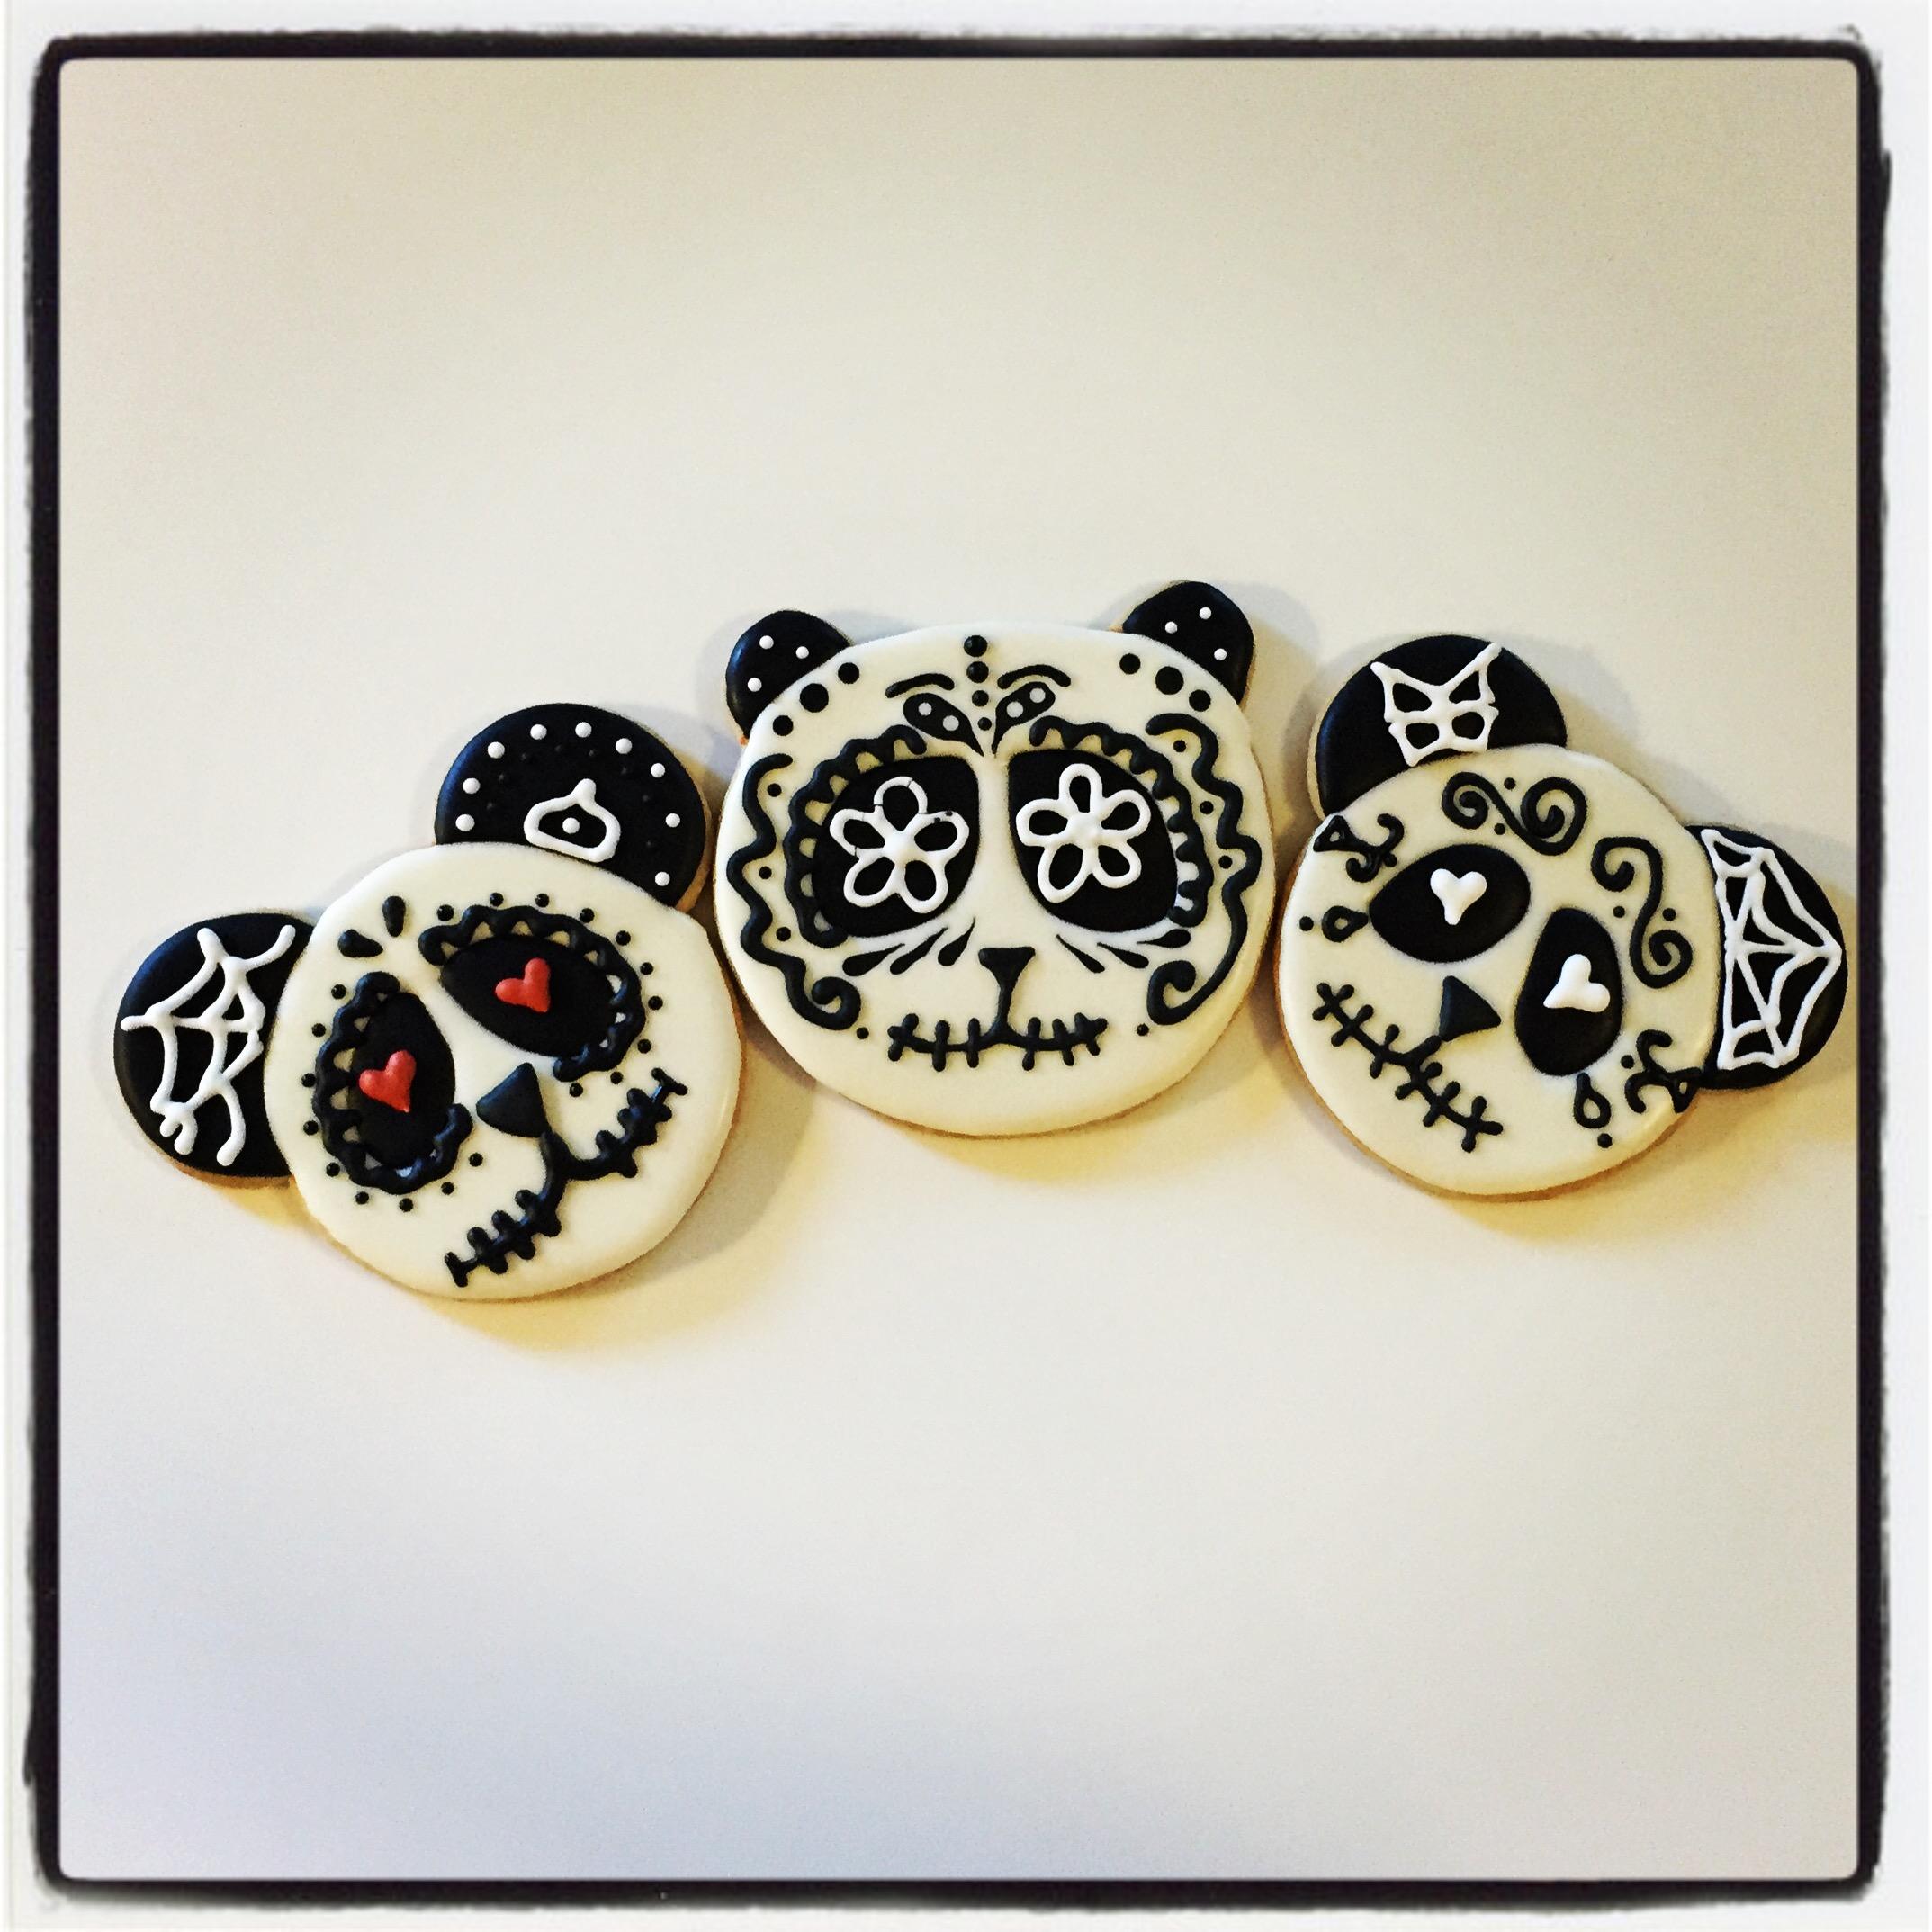 Panda Sugar Skulls   Sugarpie Custom Cookies